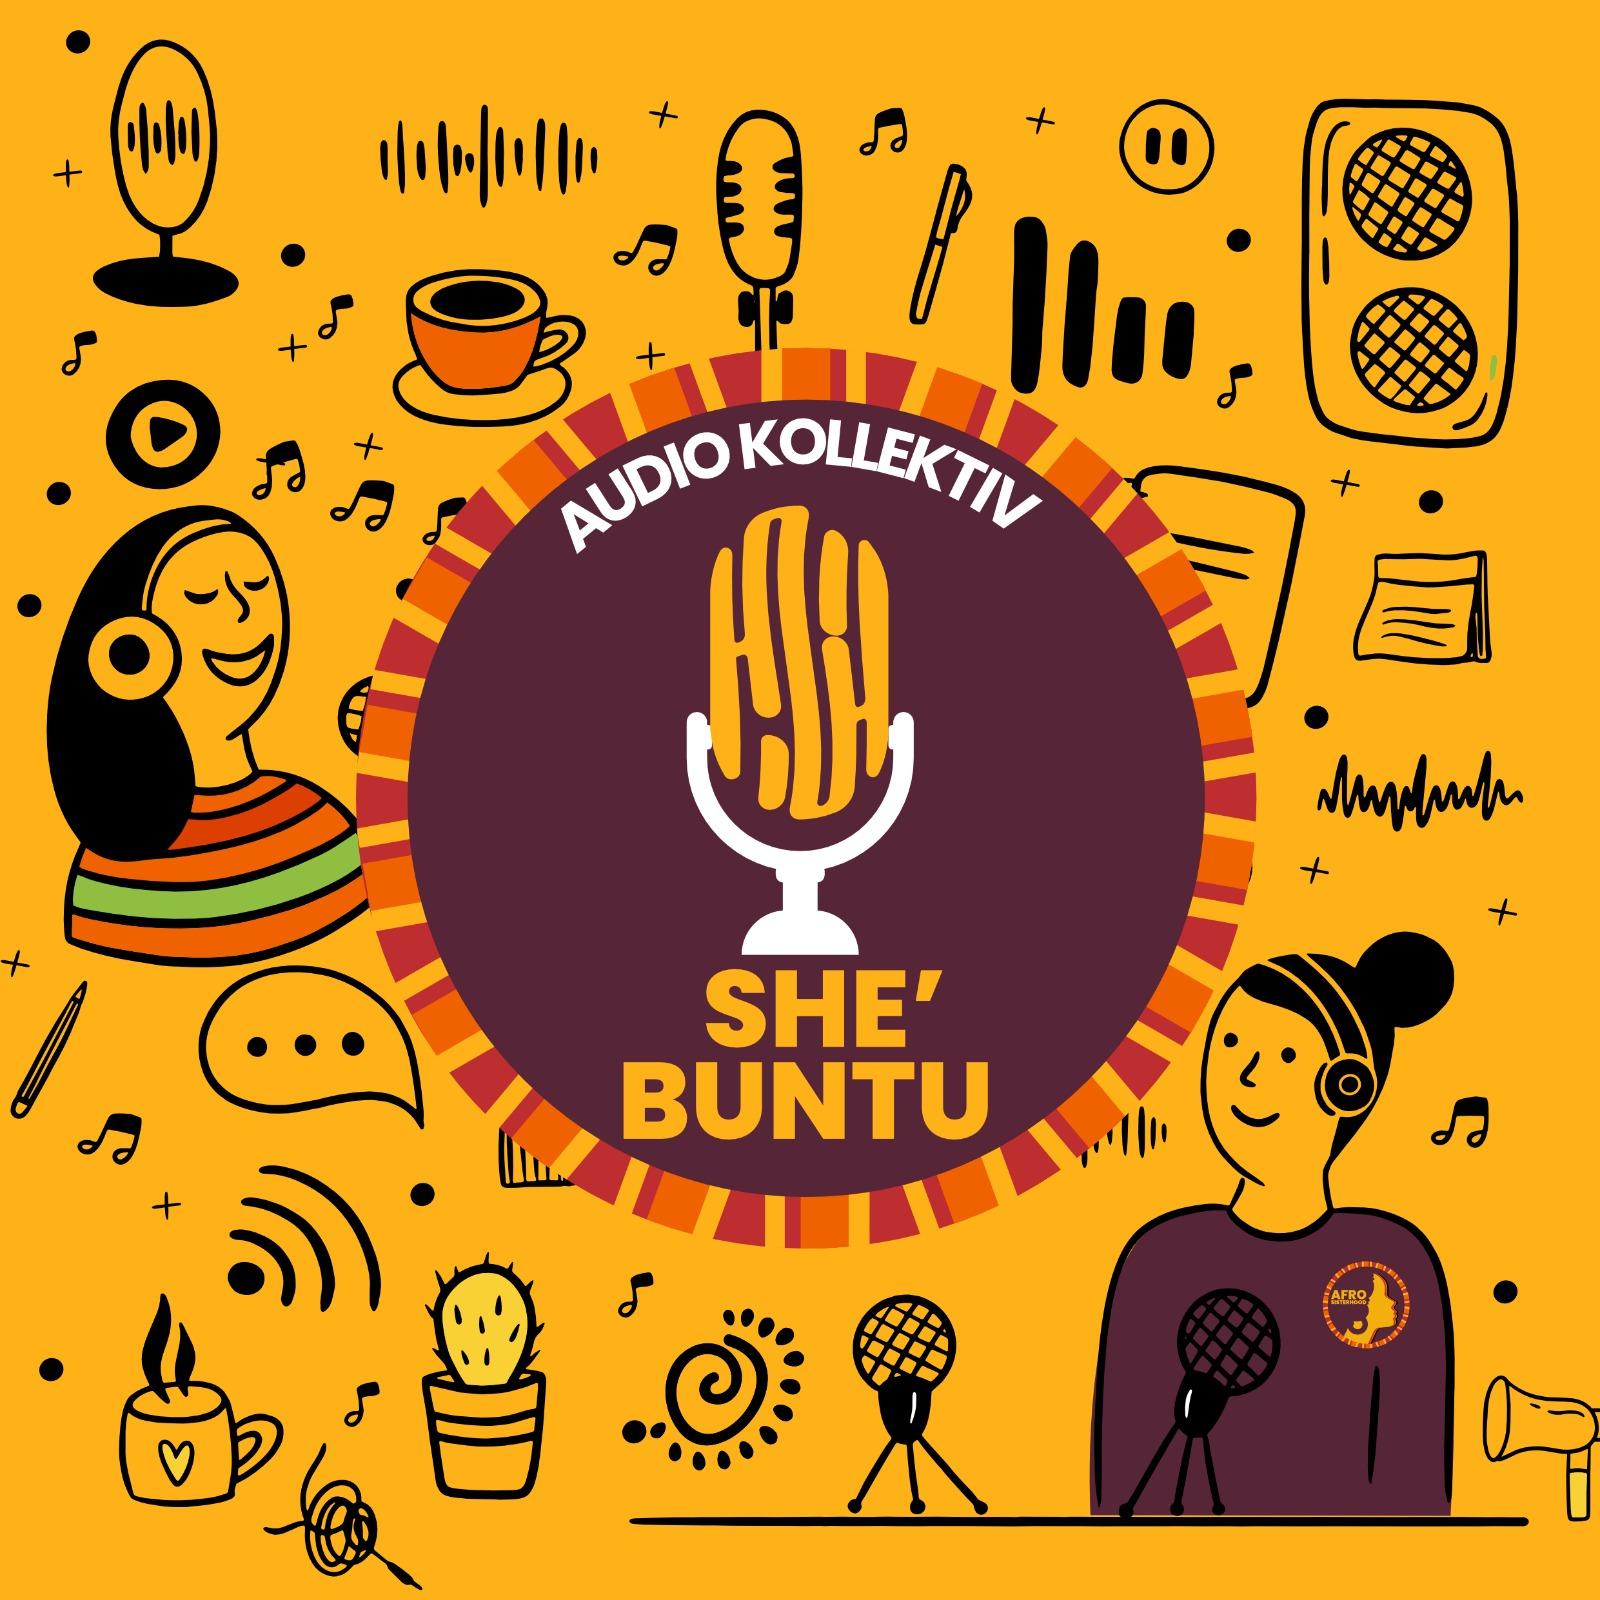 She'buntu Audio Kollektiv – motherhood, sisterhood and our daily lives in Germany